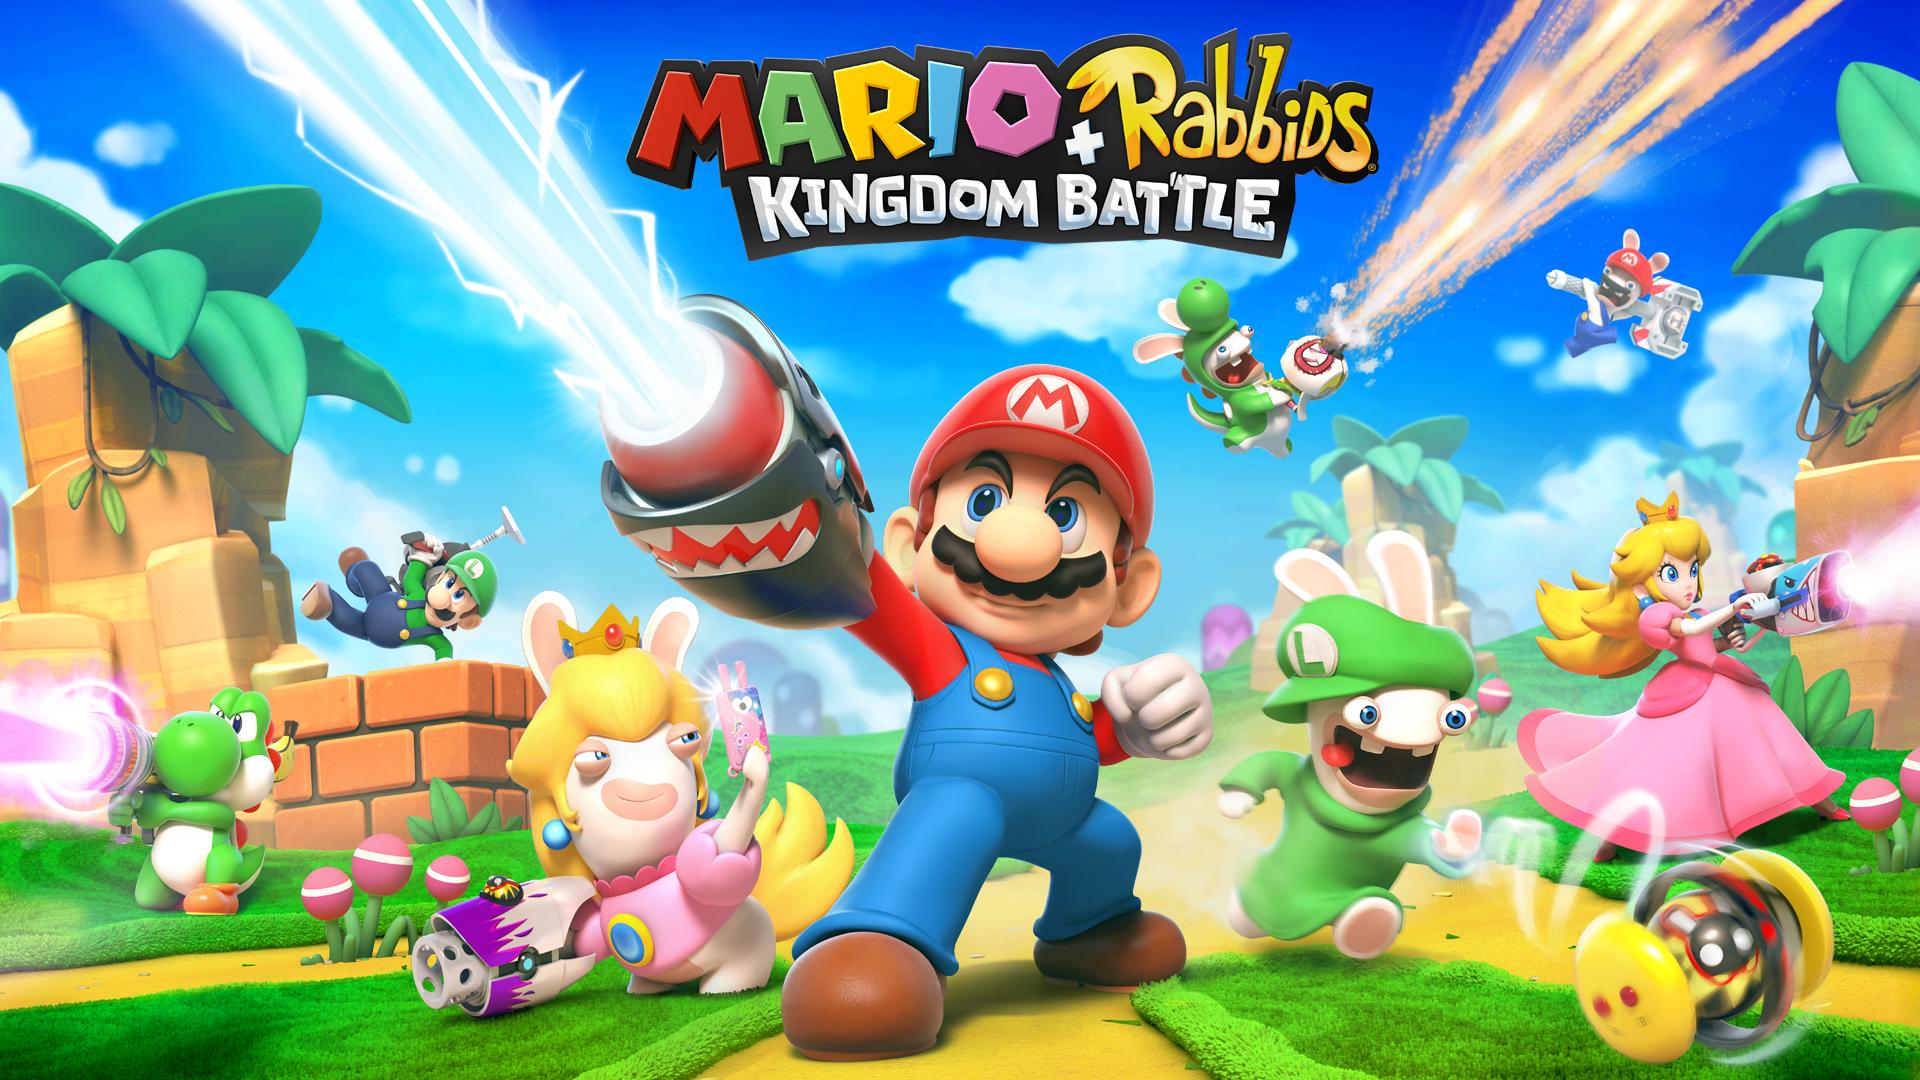 Nintendo: Mario + Rabbids® Kingdom Battle version digital